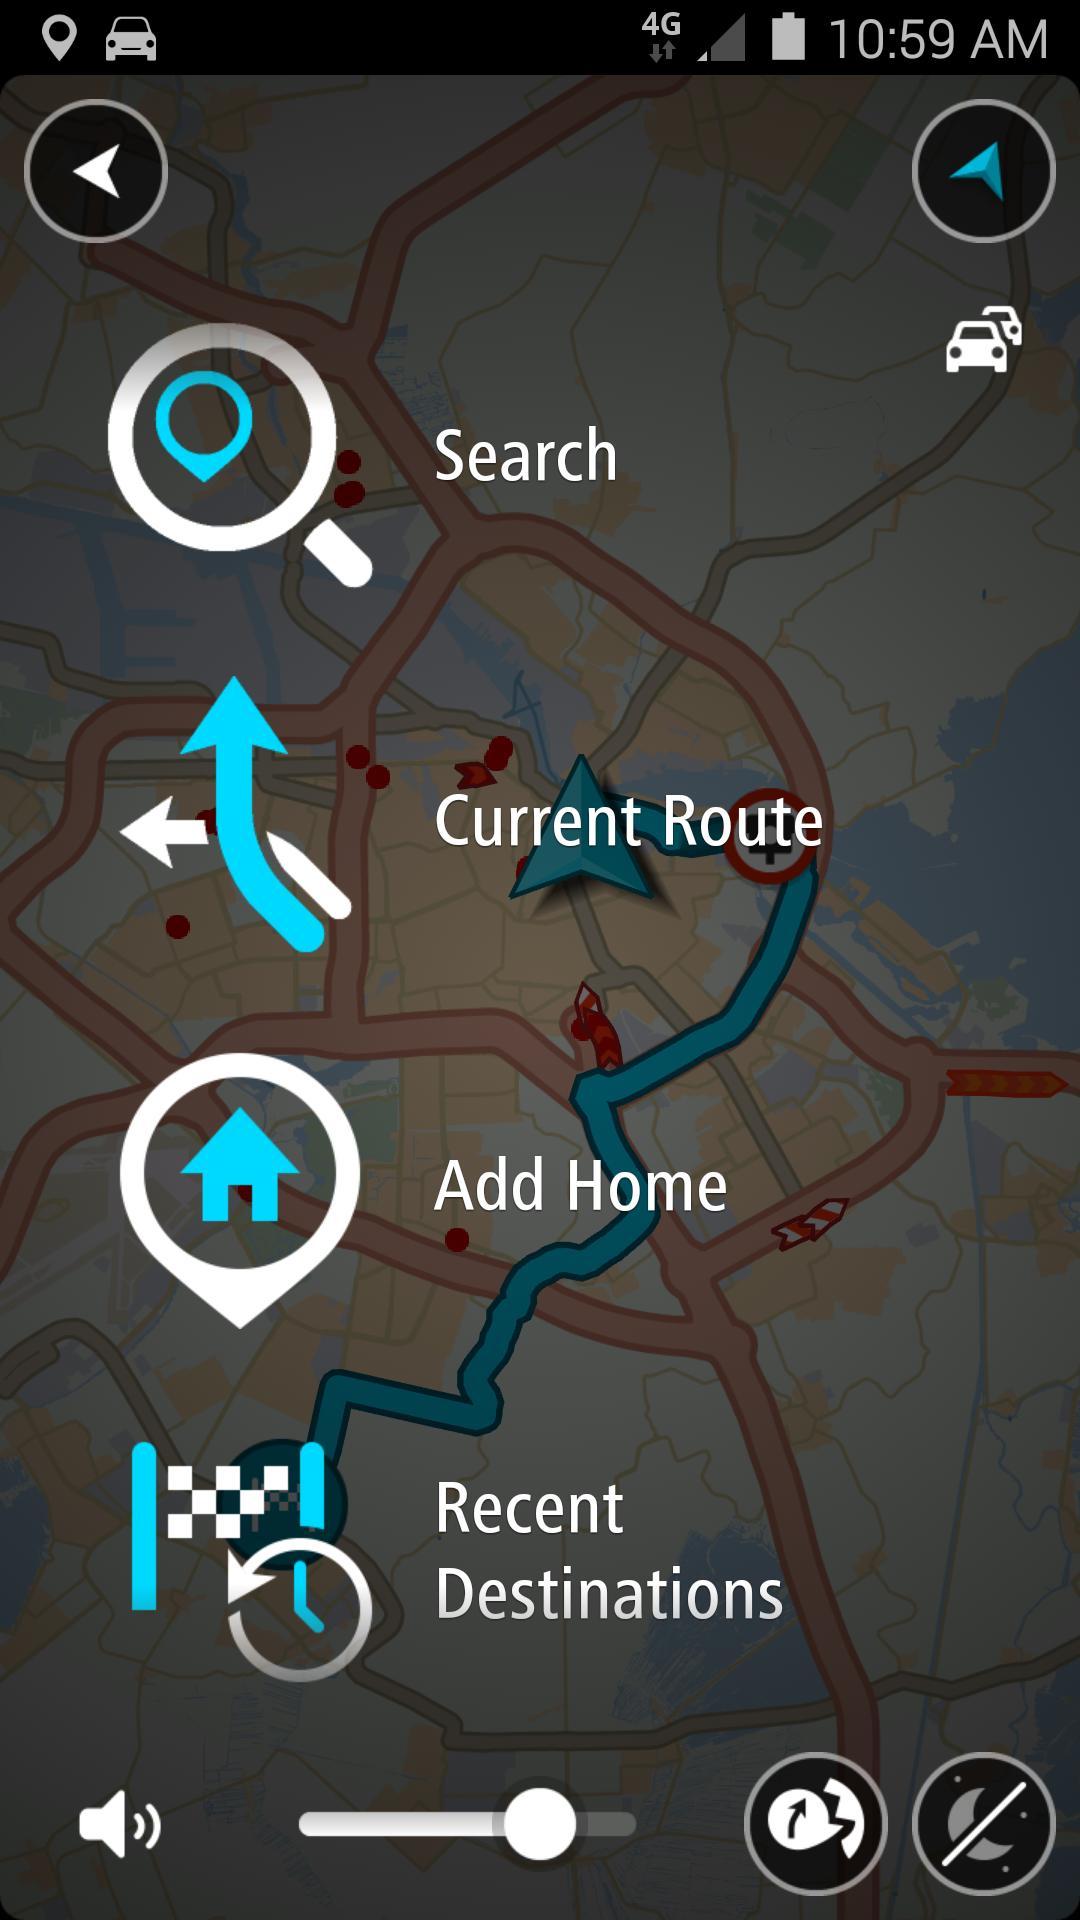 TomTom GPS Navigation - Live Traffic Alerts & Maps 2.0.4 Screenshot 7